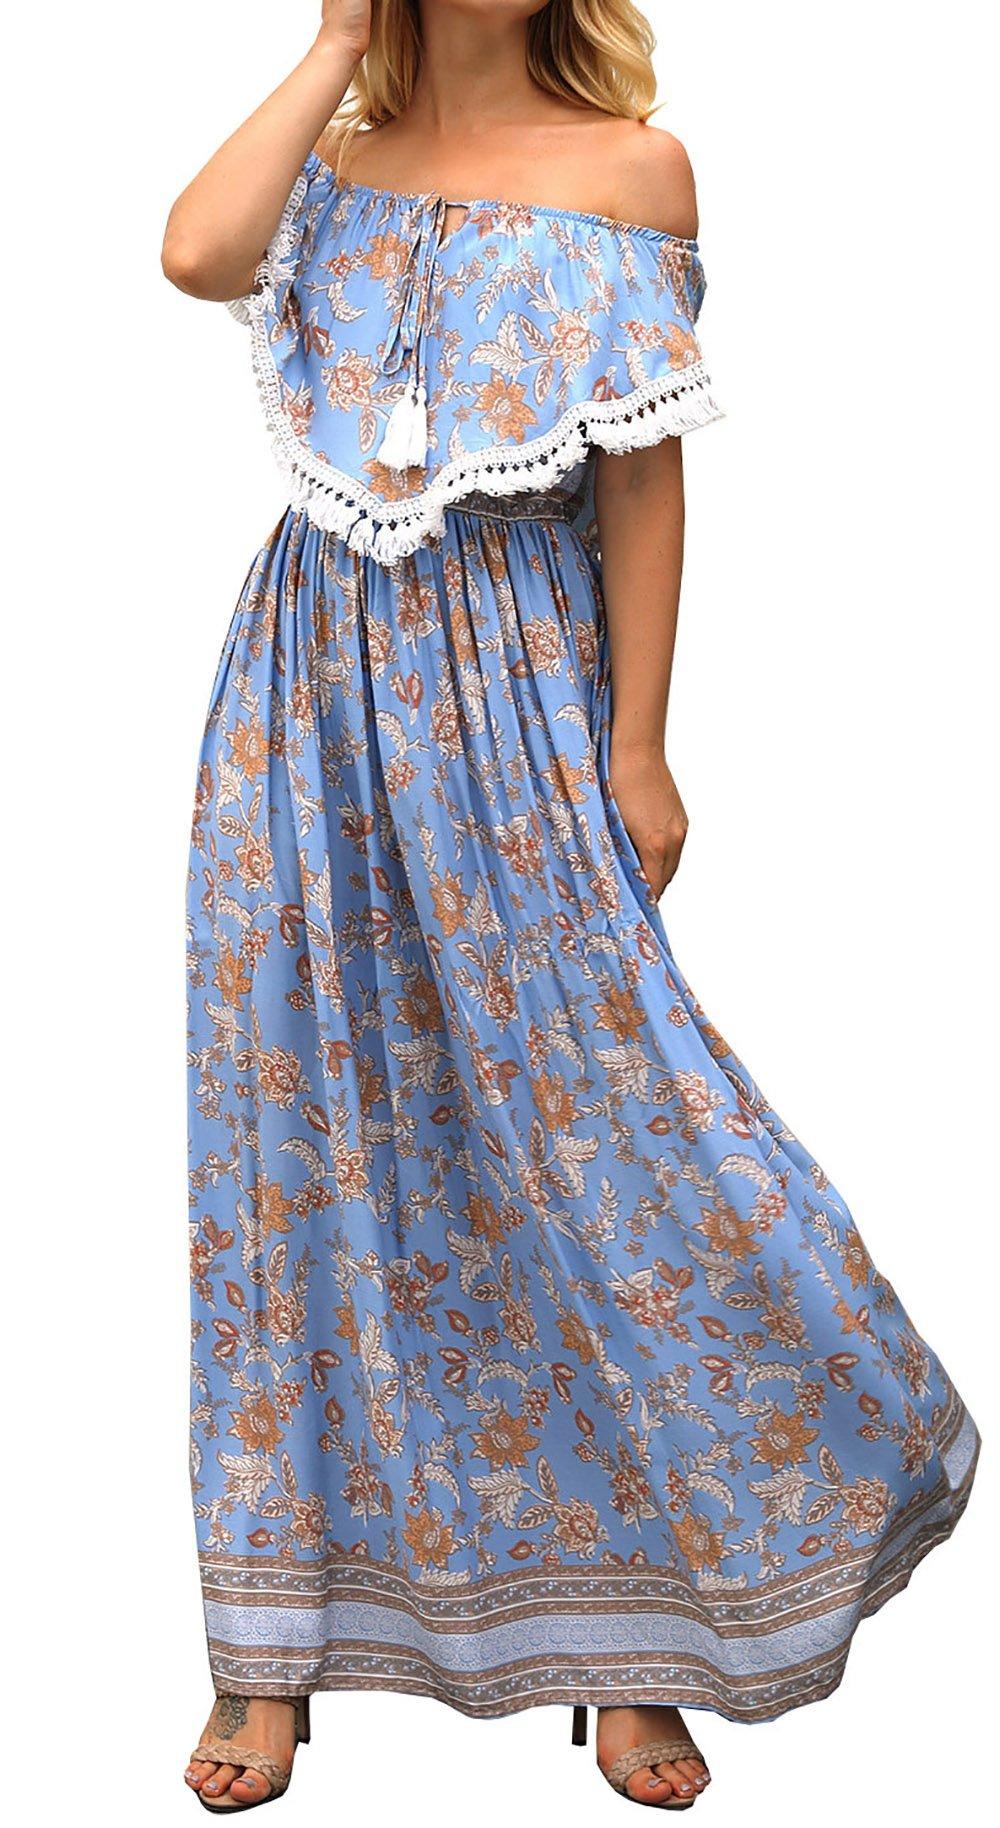 FOUR CLOUR Women's Boho Off Shoulder Short Sleeve Floral Print Casual Ruffle Long Maxi Dress